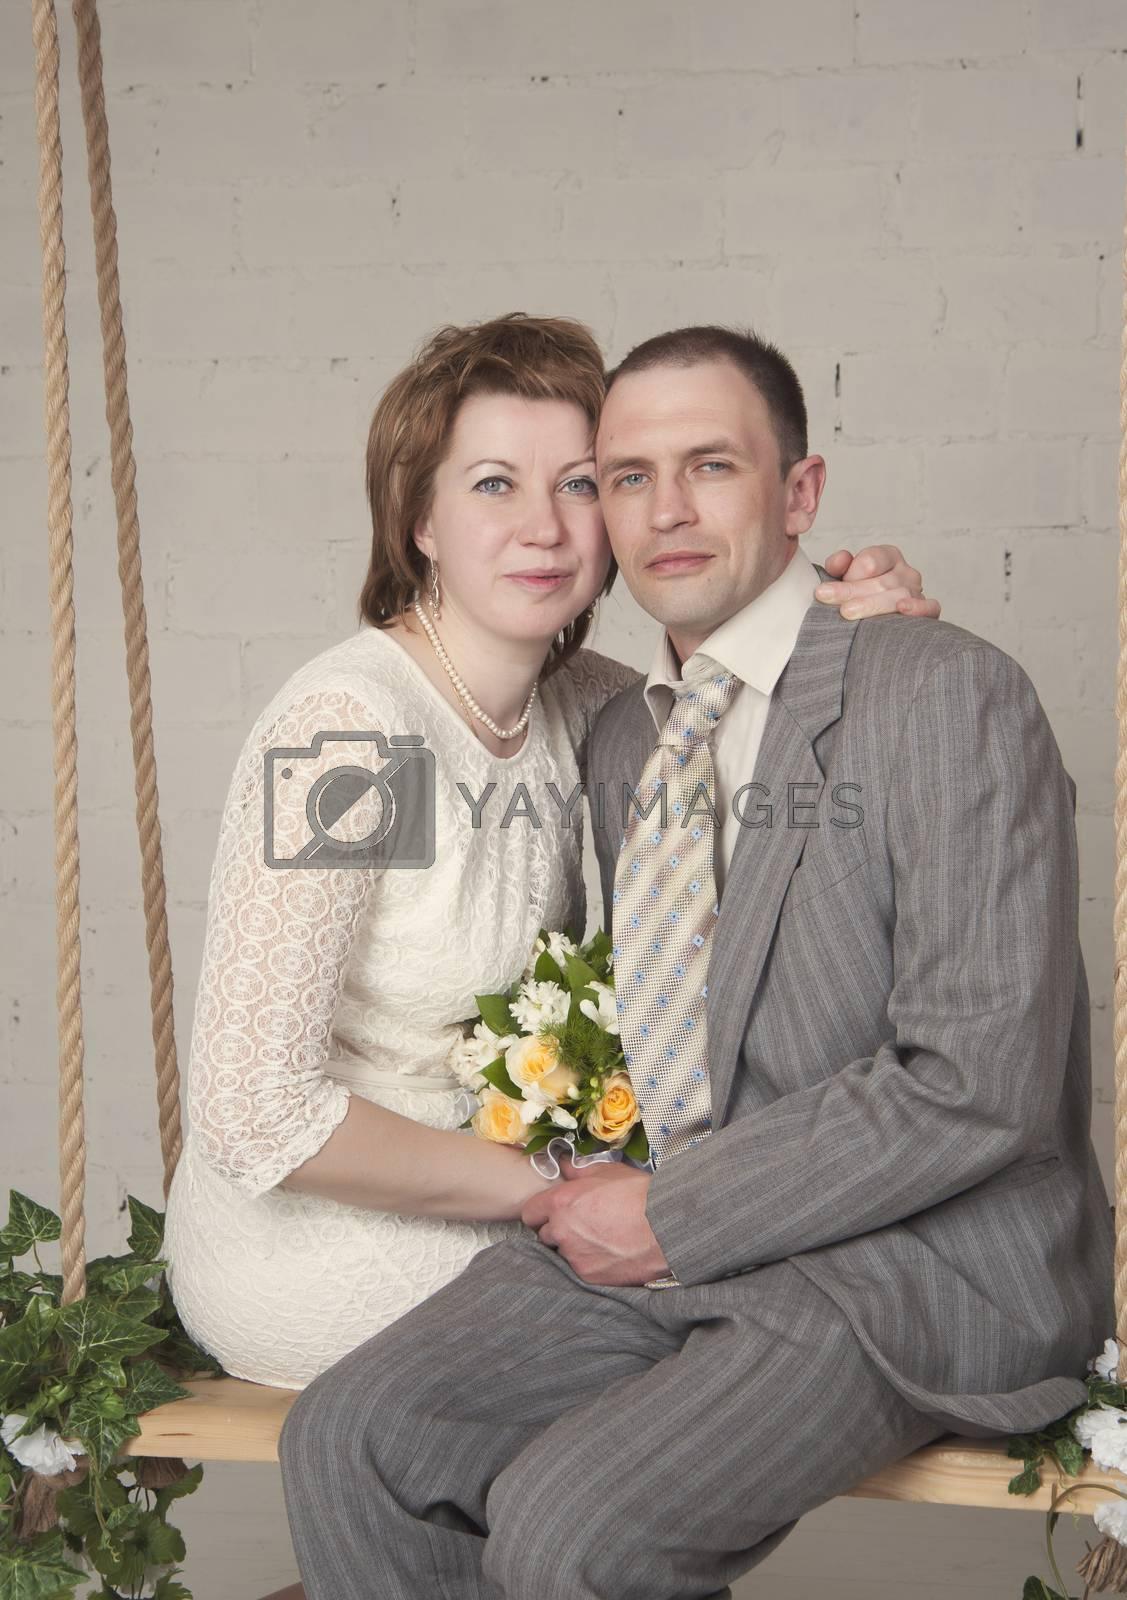 Royalty free image of bride and bridegroom by raduga21